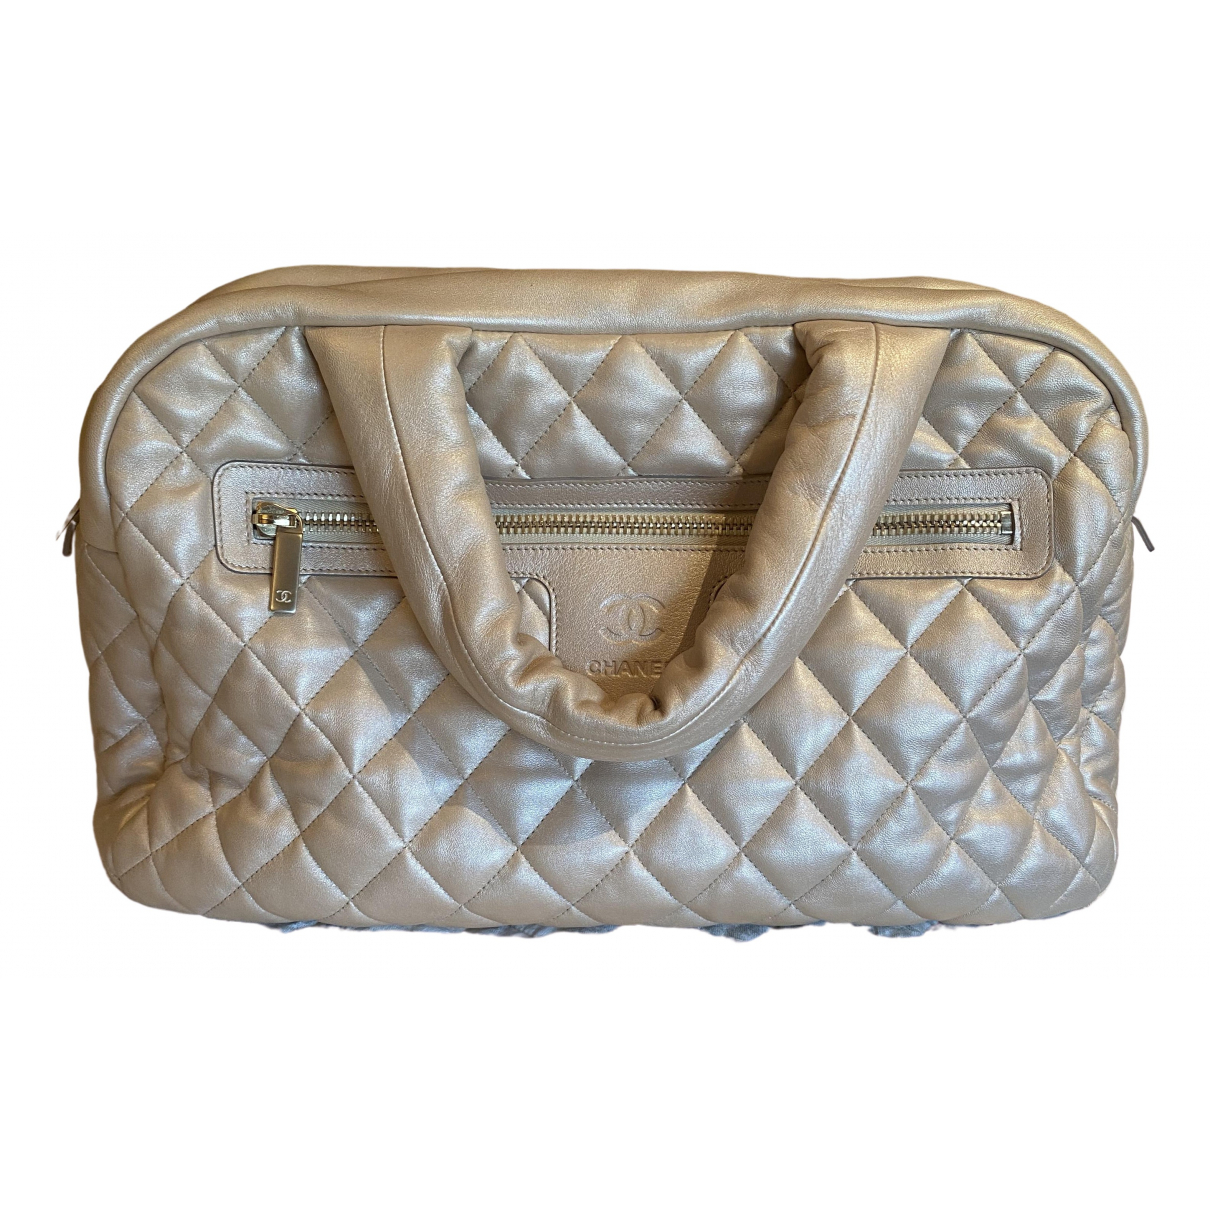 Chanel - Sac de voyage Coco Cocoon pour femme en cuir - dore